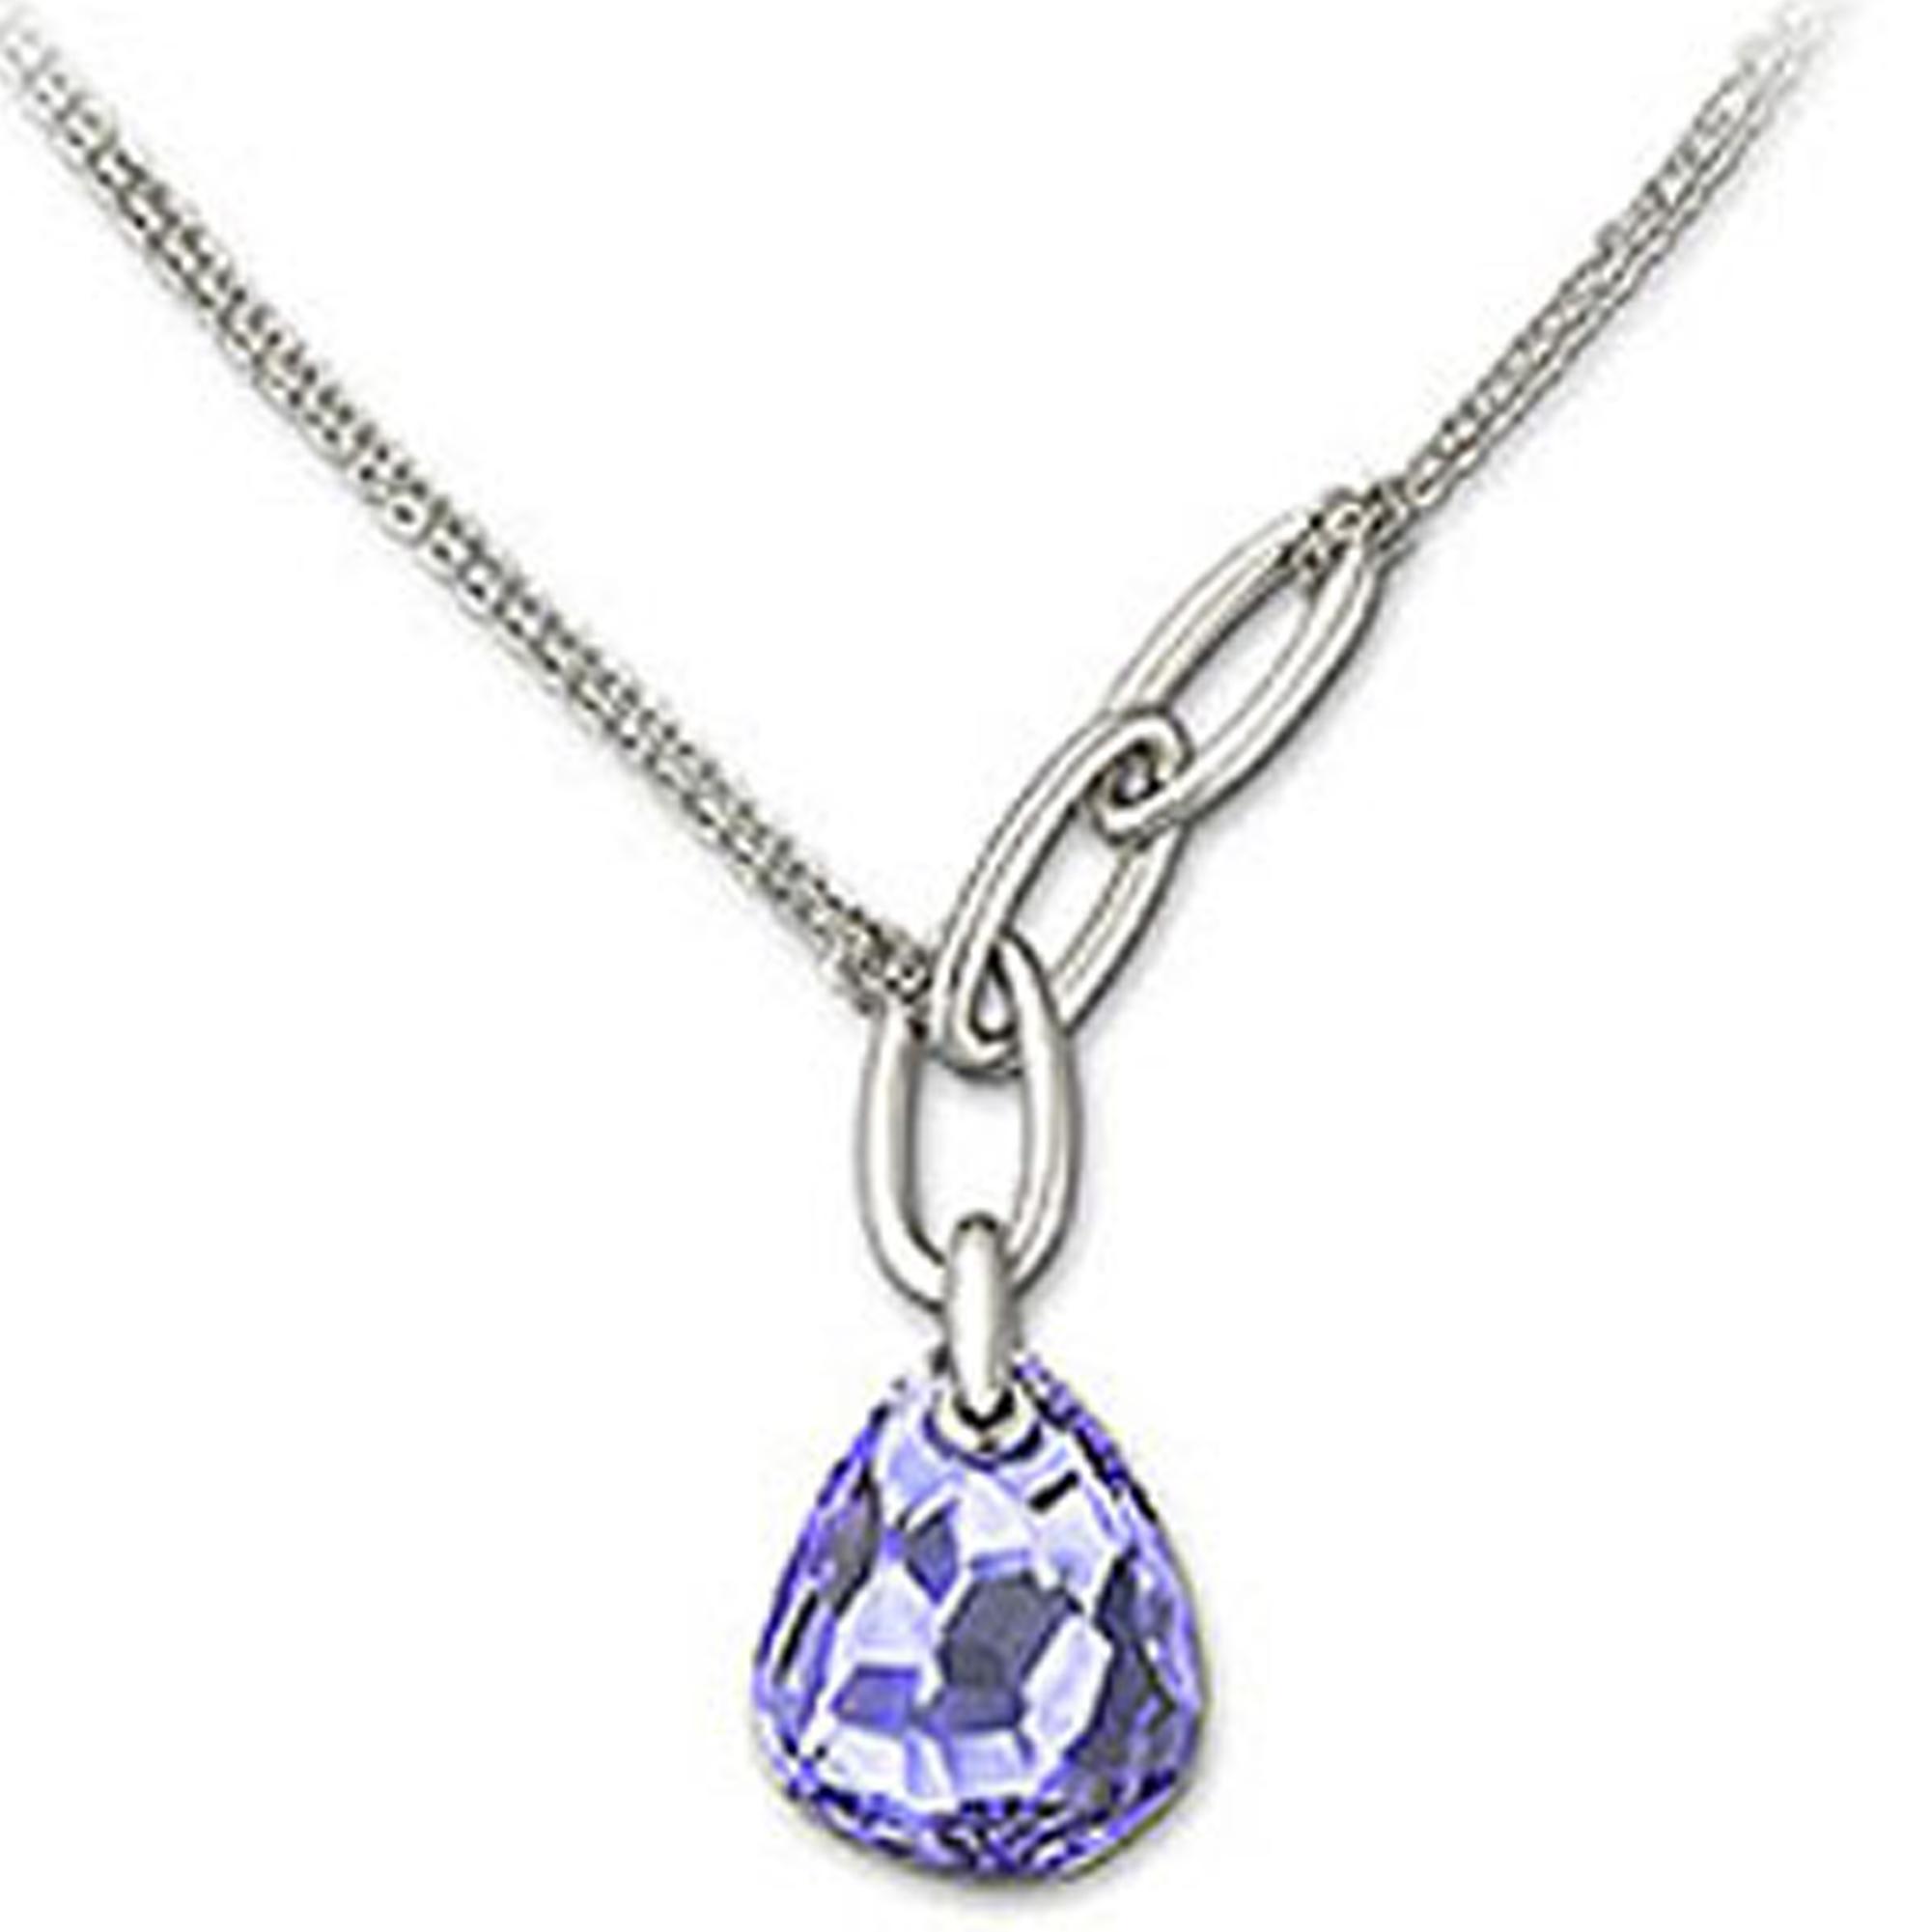 3dd7740b3f481 Swarovski Purple Tanzanite Crystal Parallele Necklace NGCNK0398